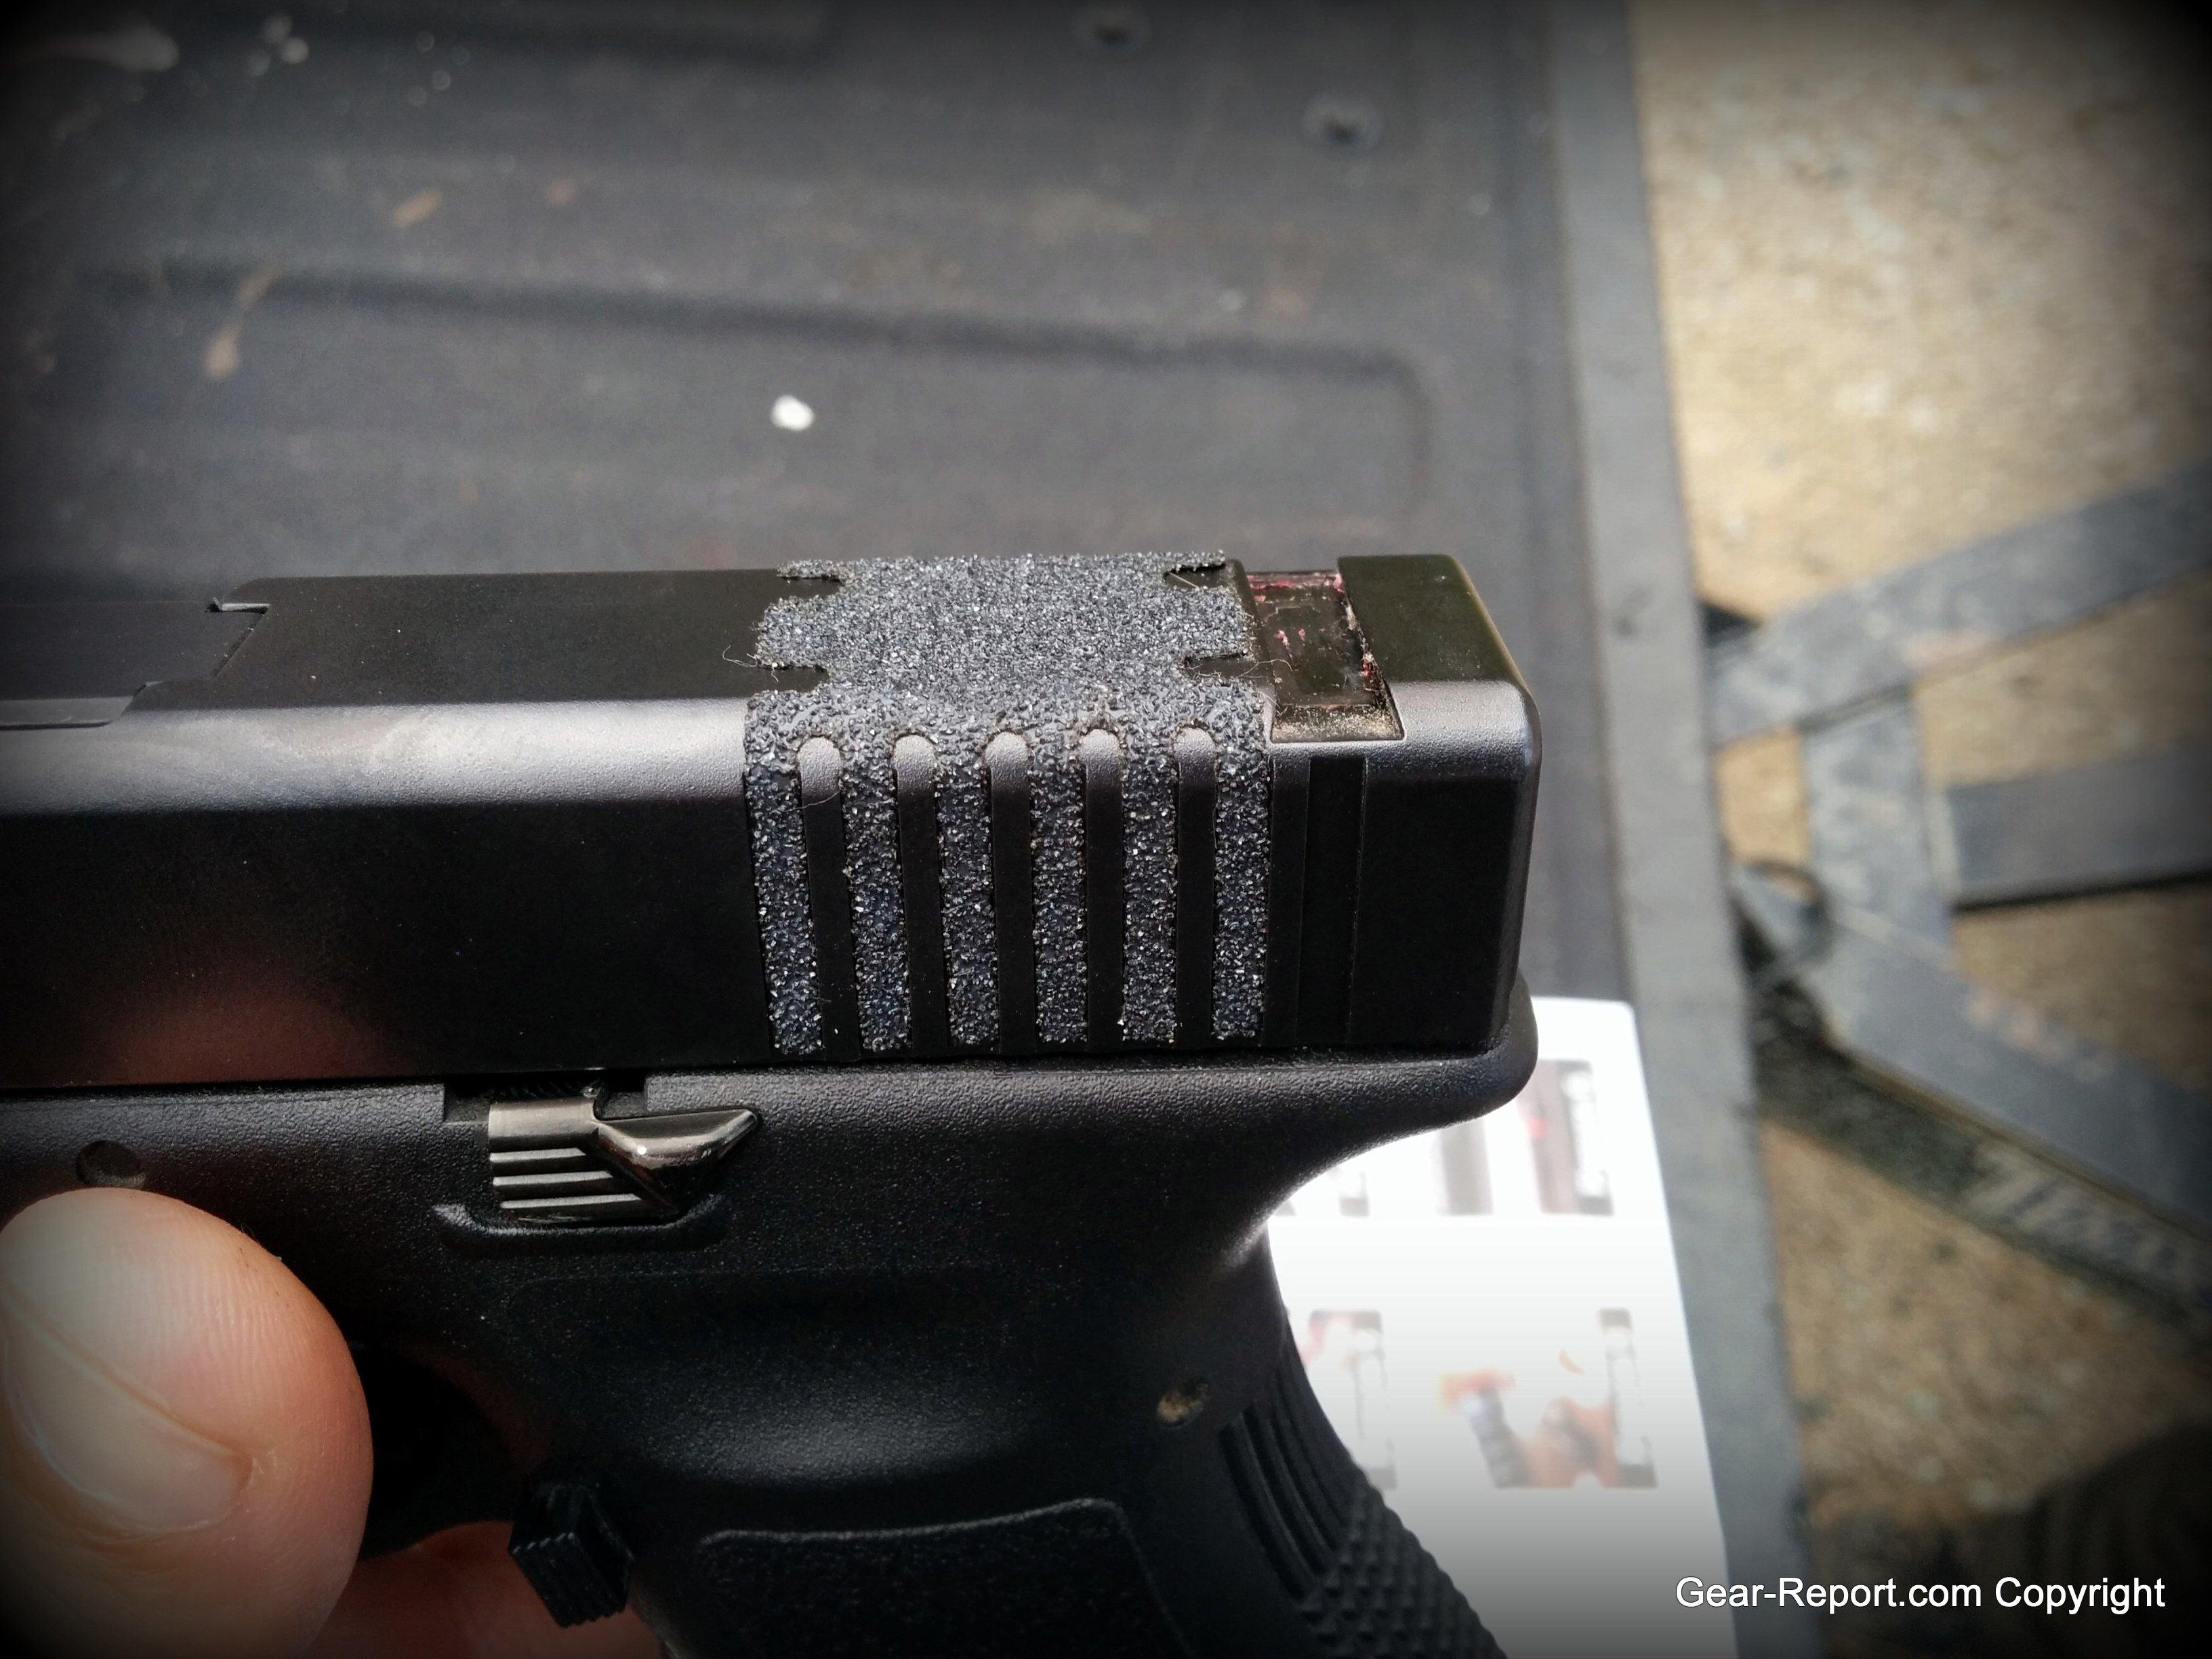 ArachniGRIP Slide Spider install on Jason's Glock 26